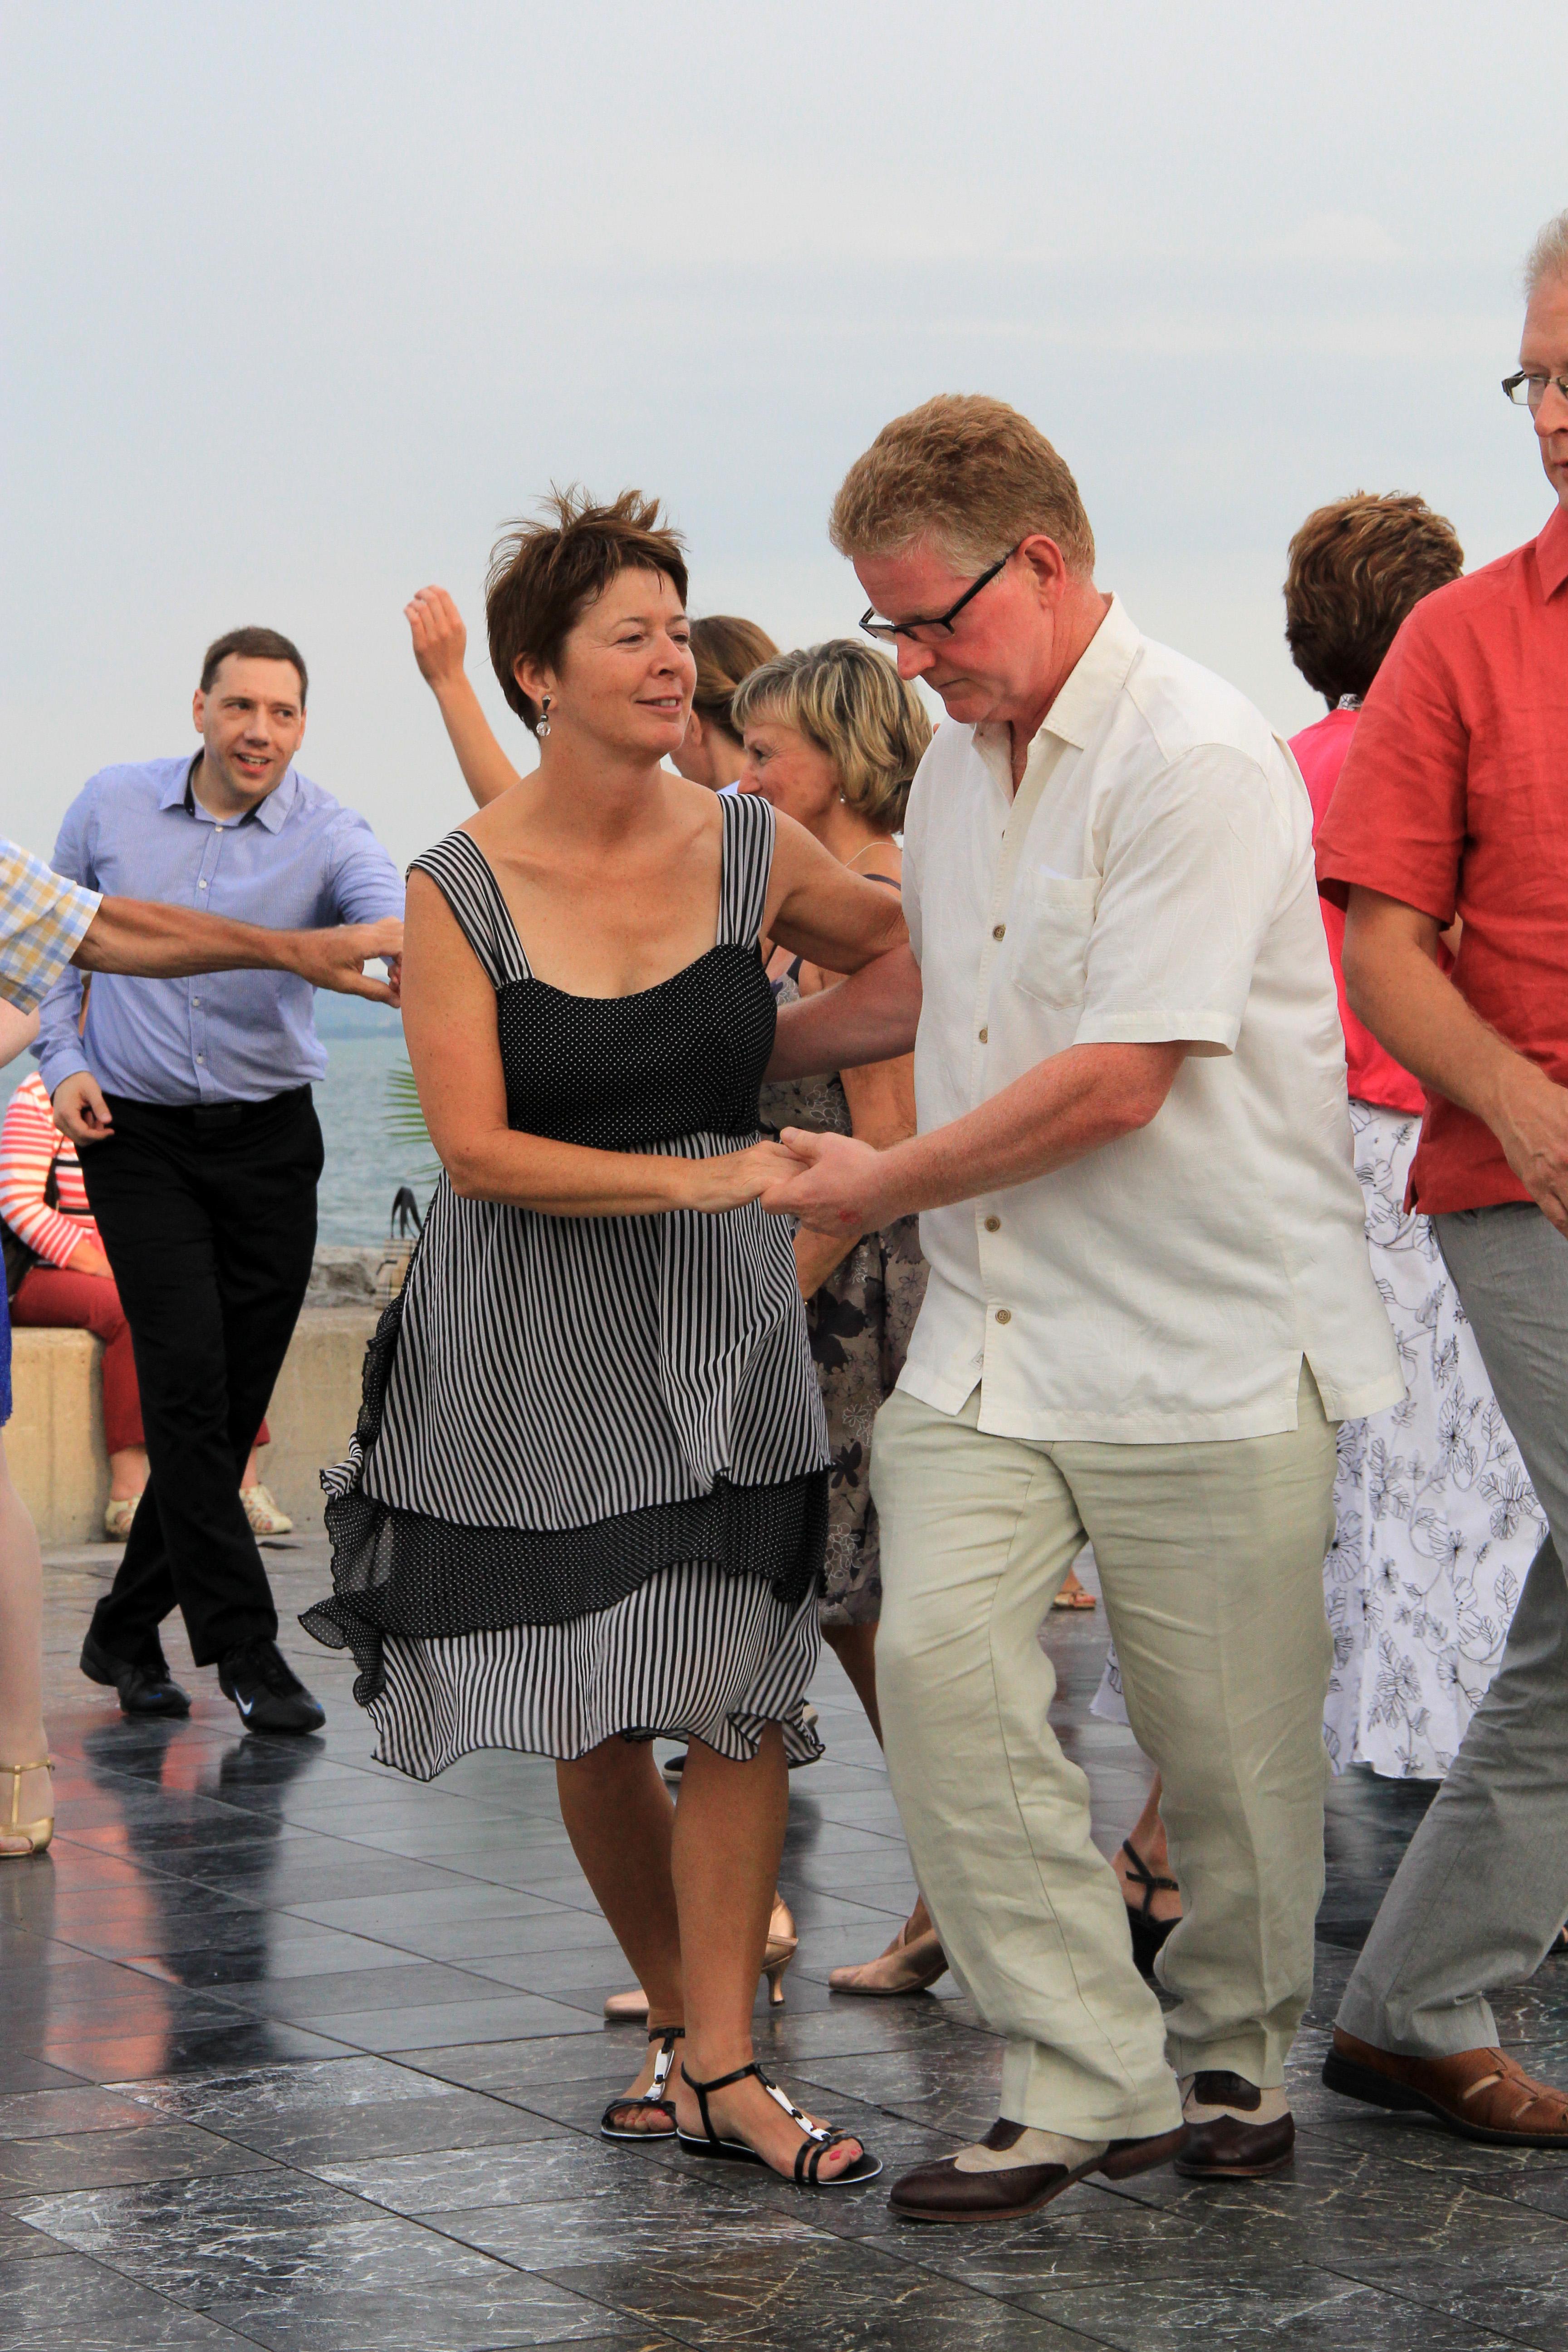 Dance - health benefits